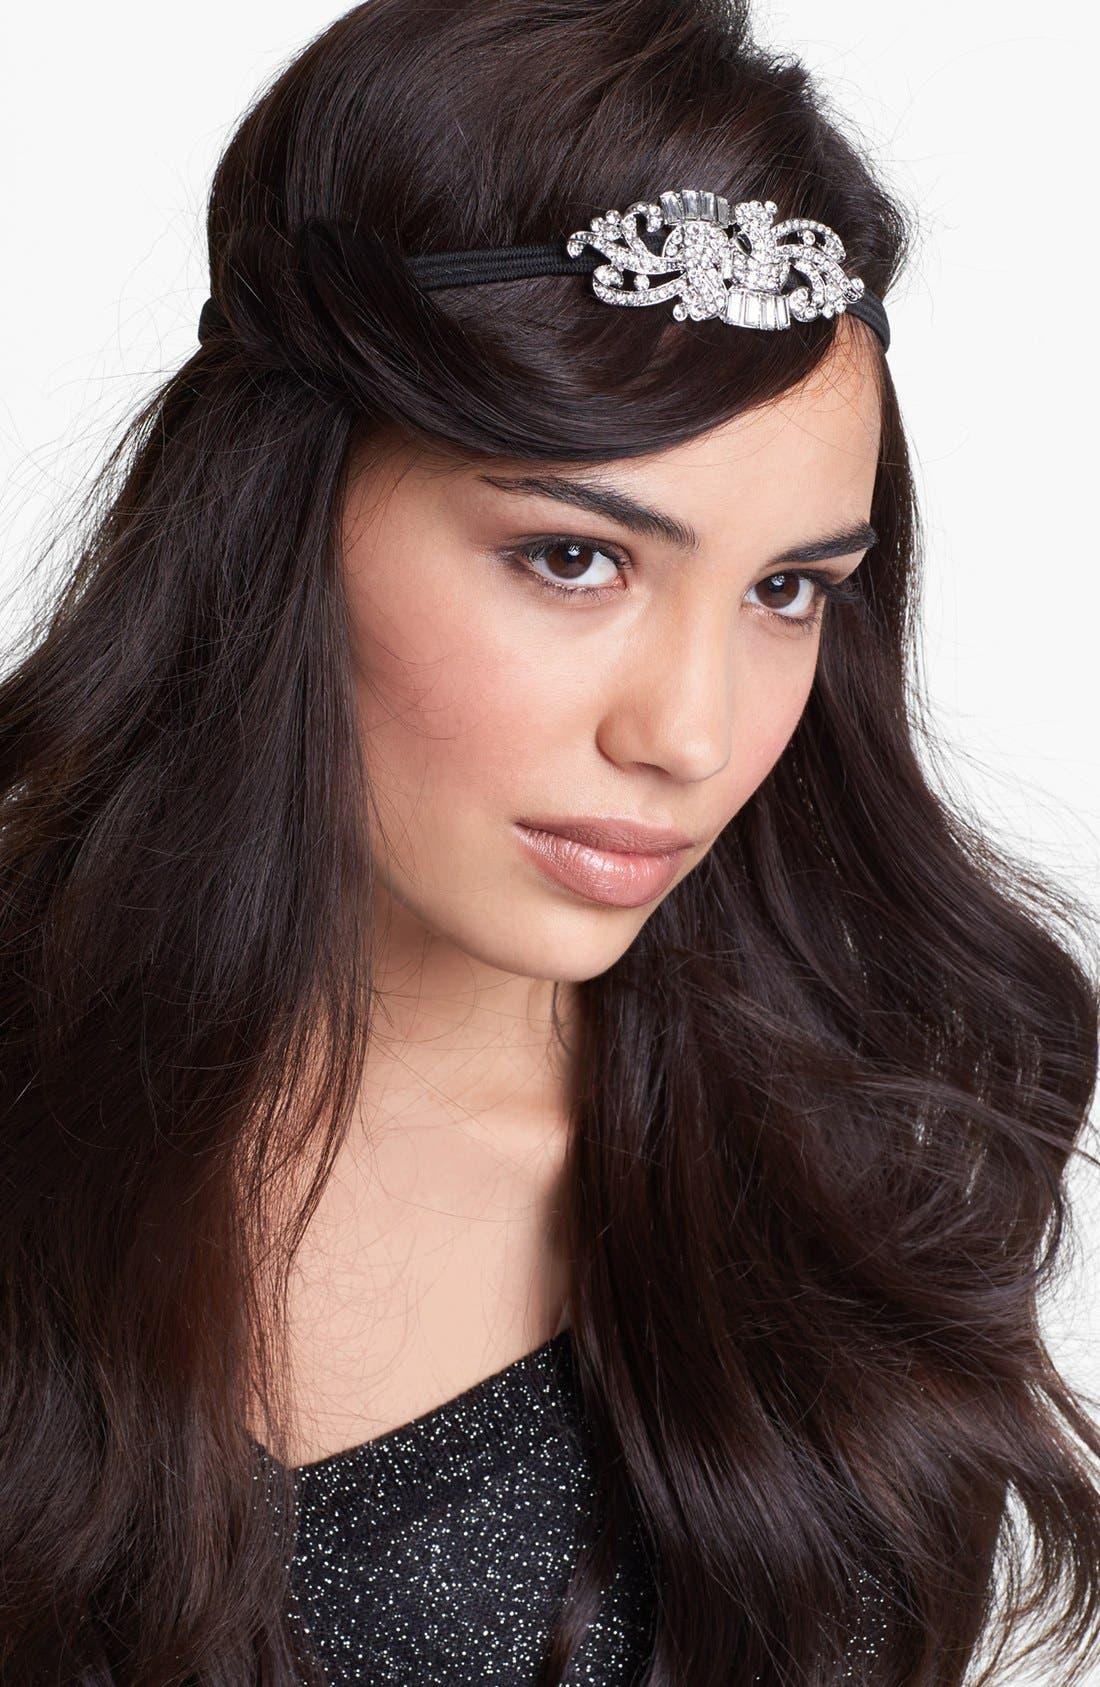 Alternate Image 1 Selected - Cara 'Maxine' Crystal Head Wrap